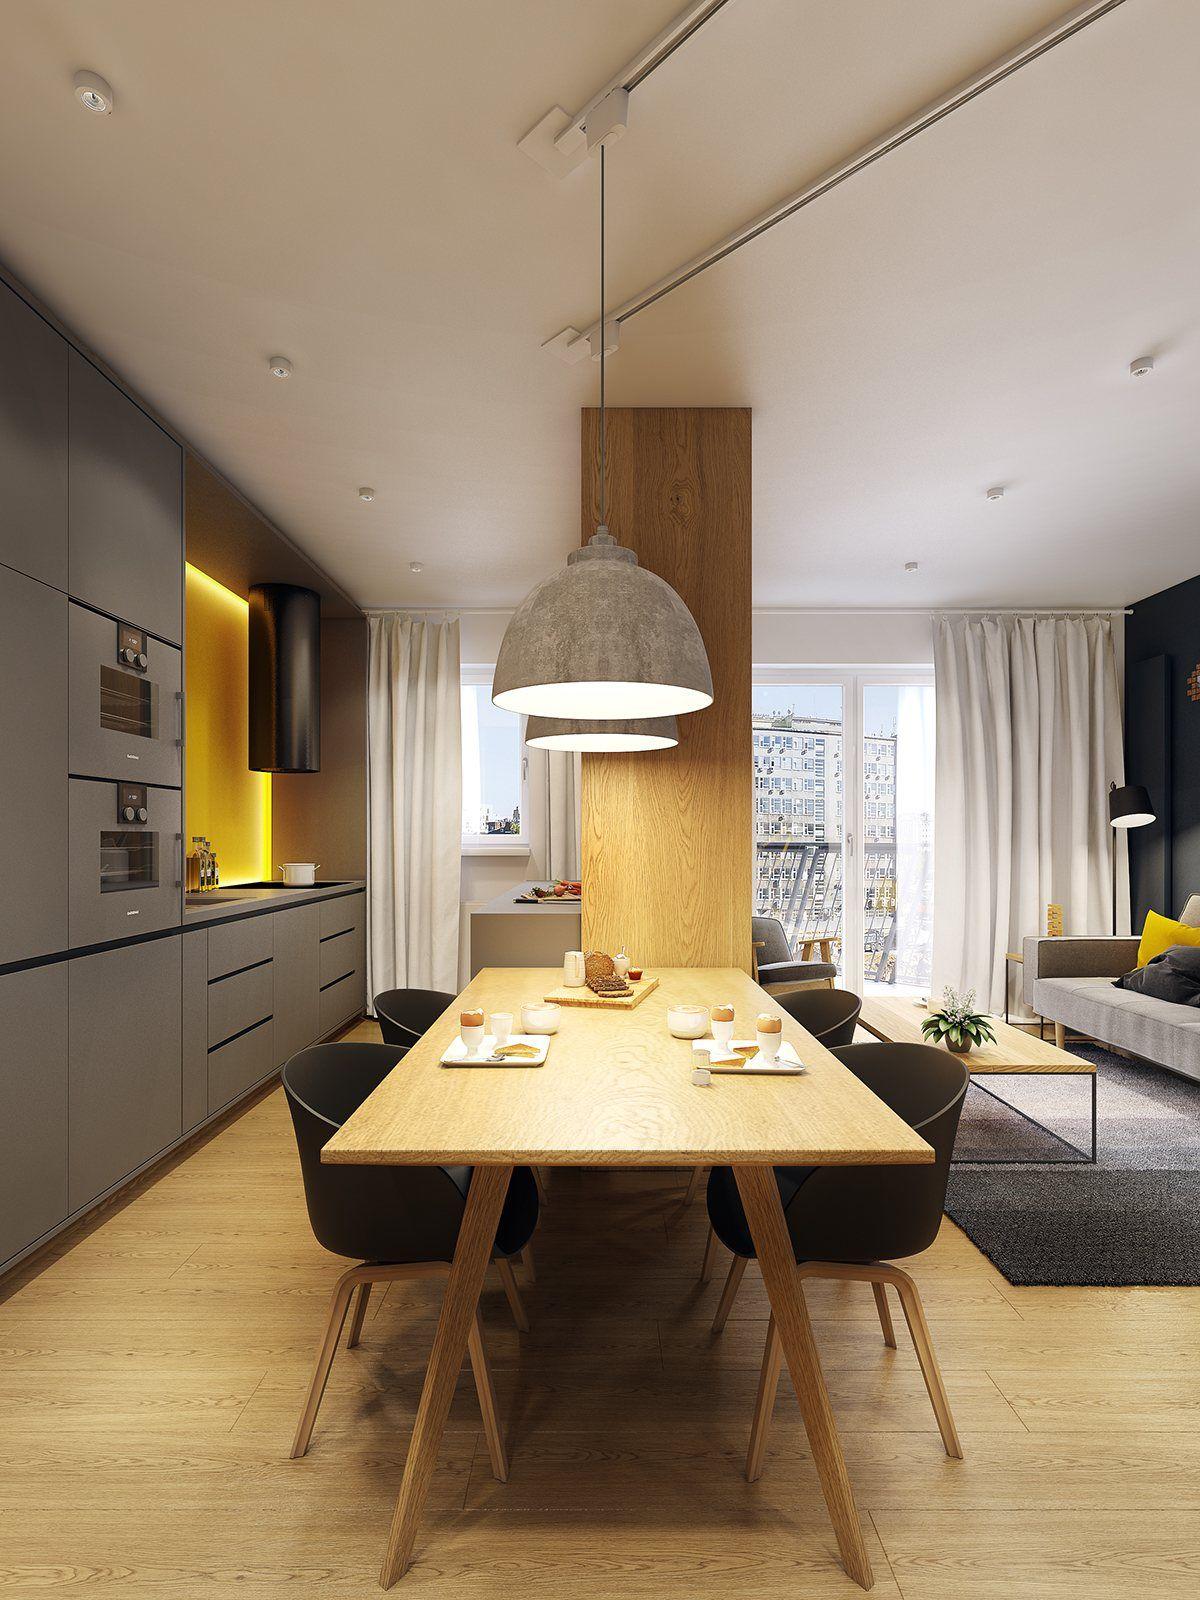 Appartement moderne scandinave ingénieux | Pinterest | Waage ...